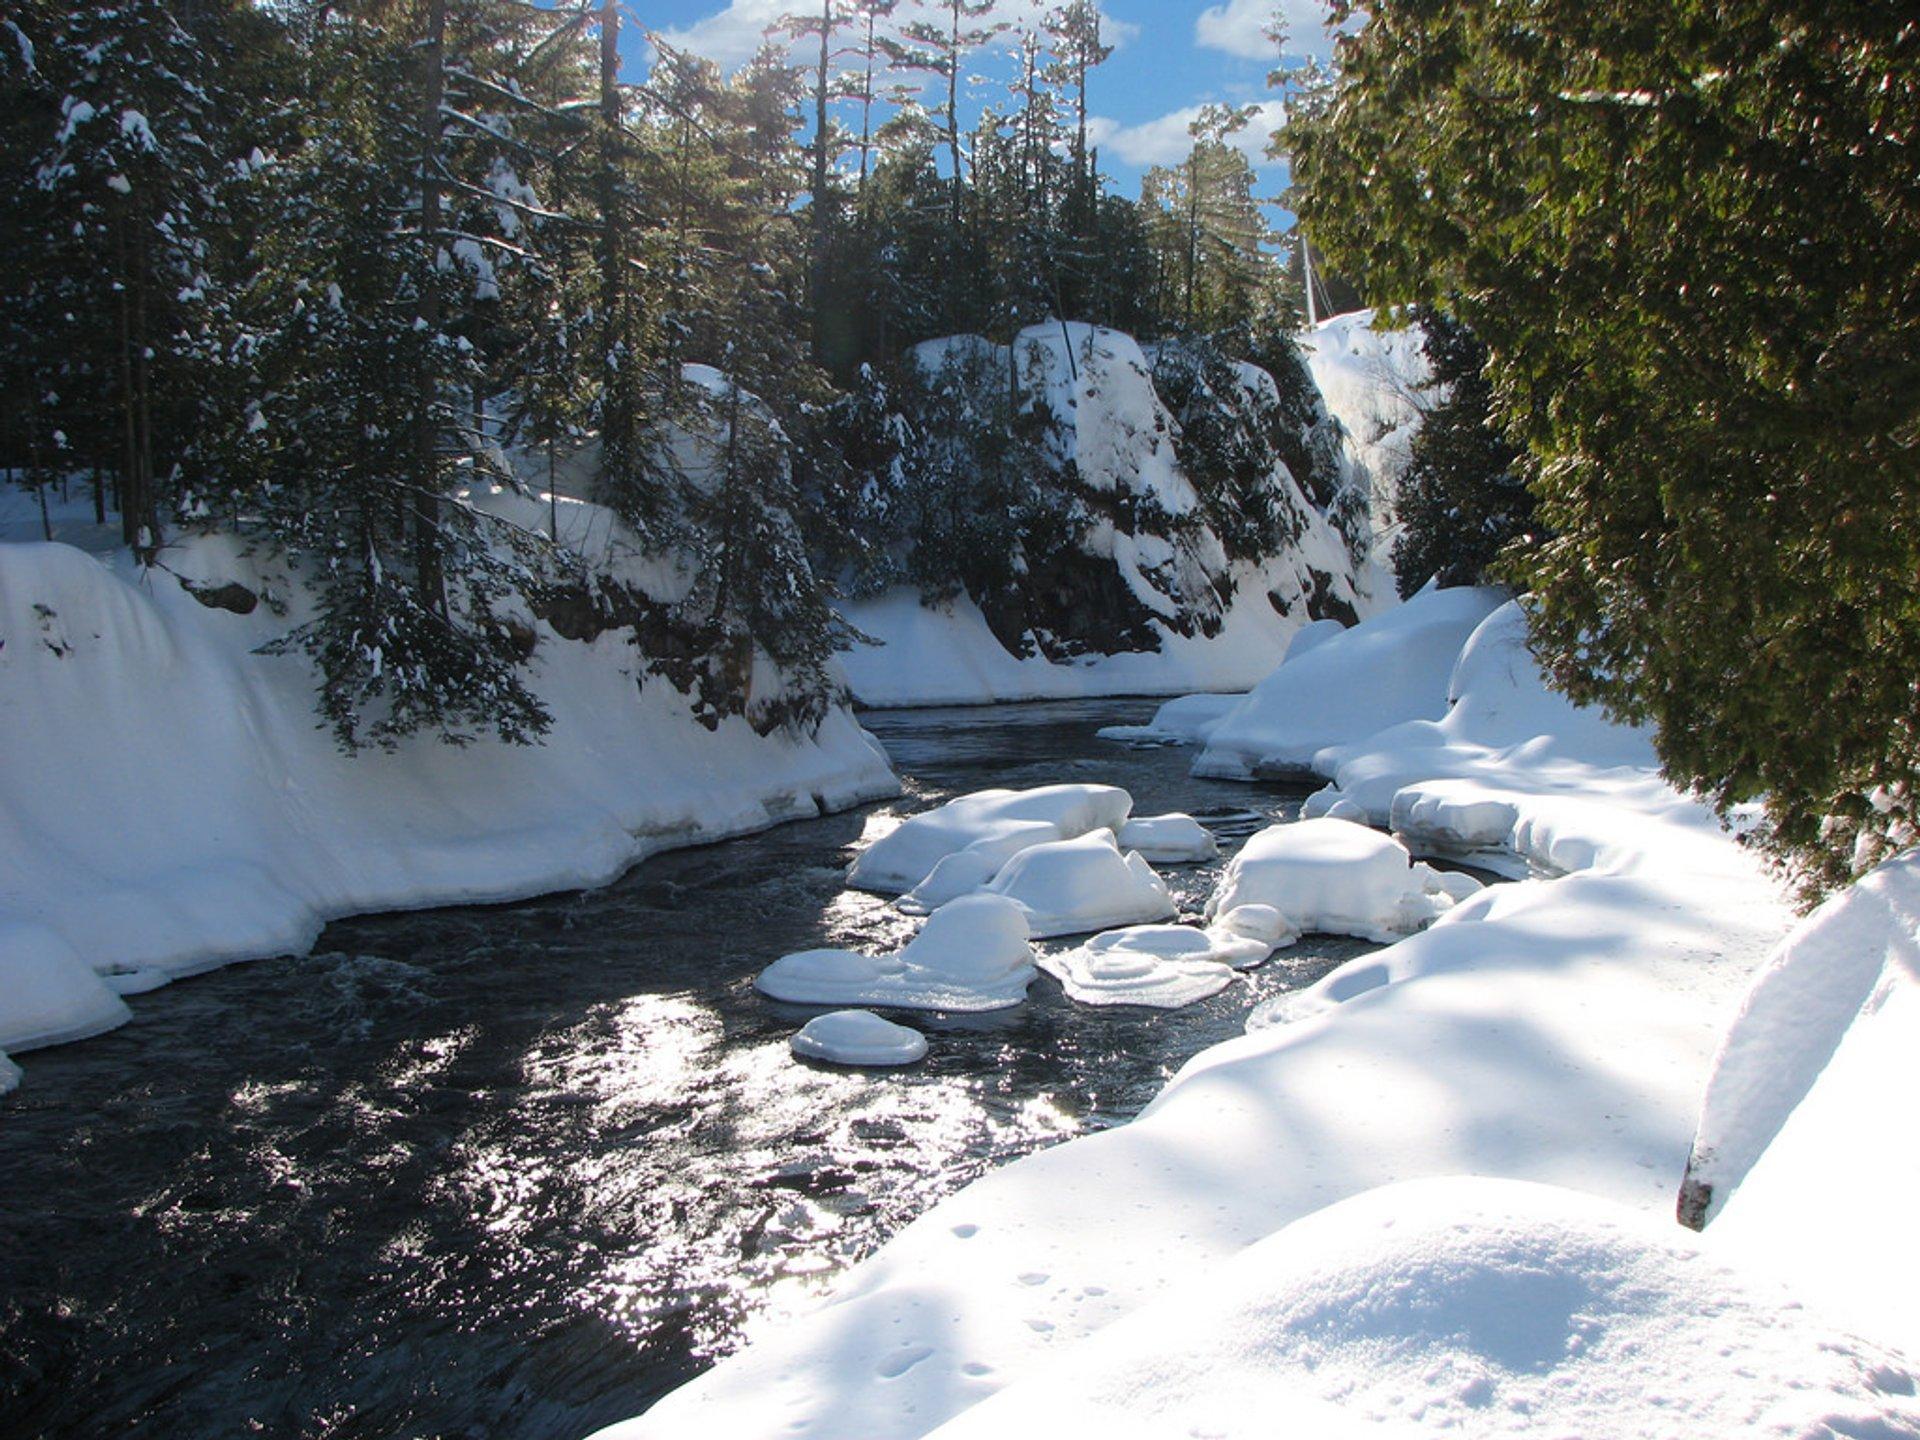 Dorwin falls (Rawdon, Quebec) 2020